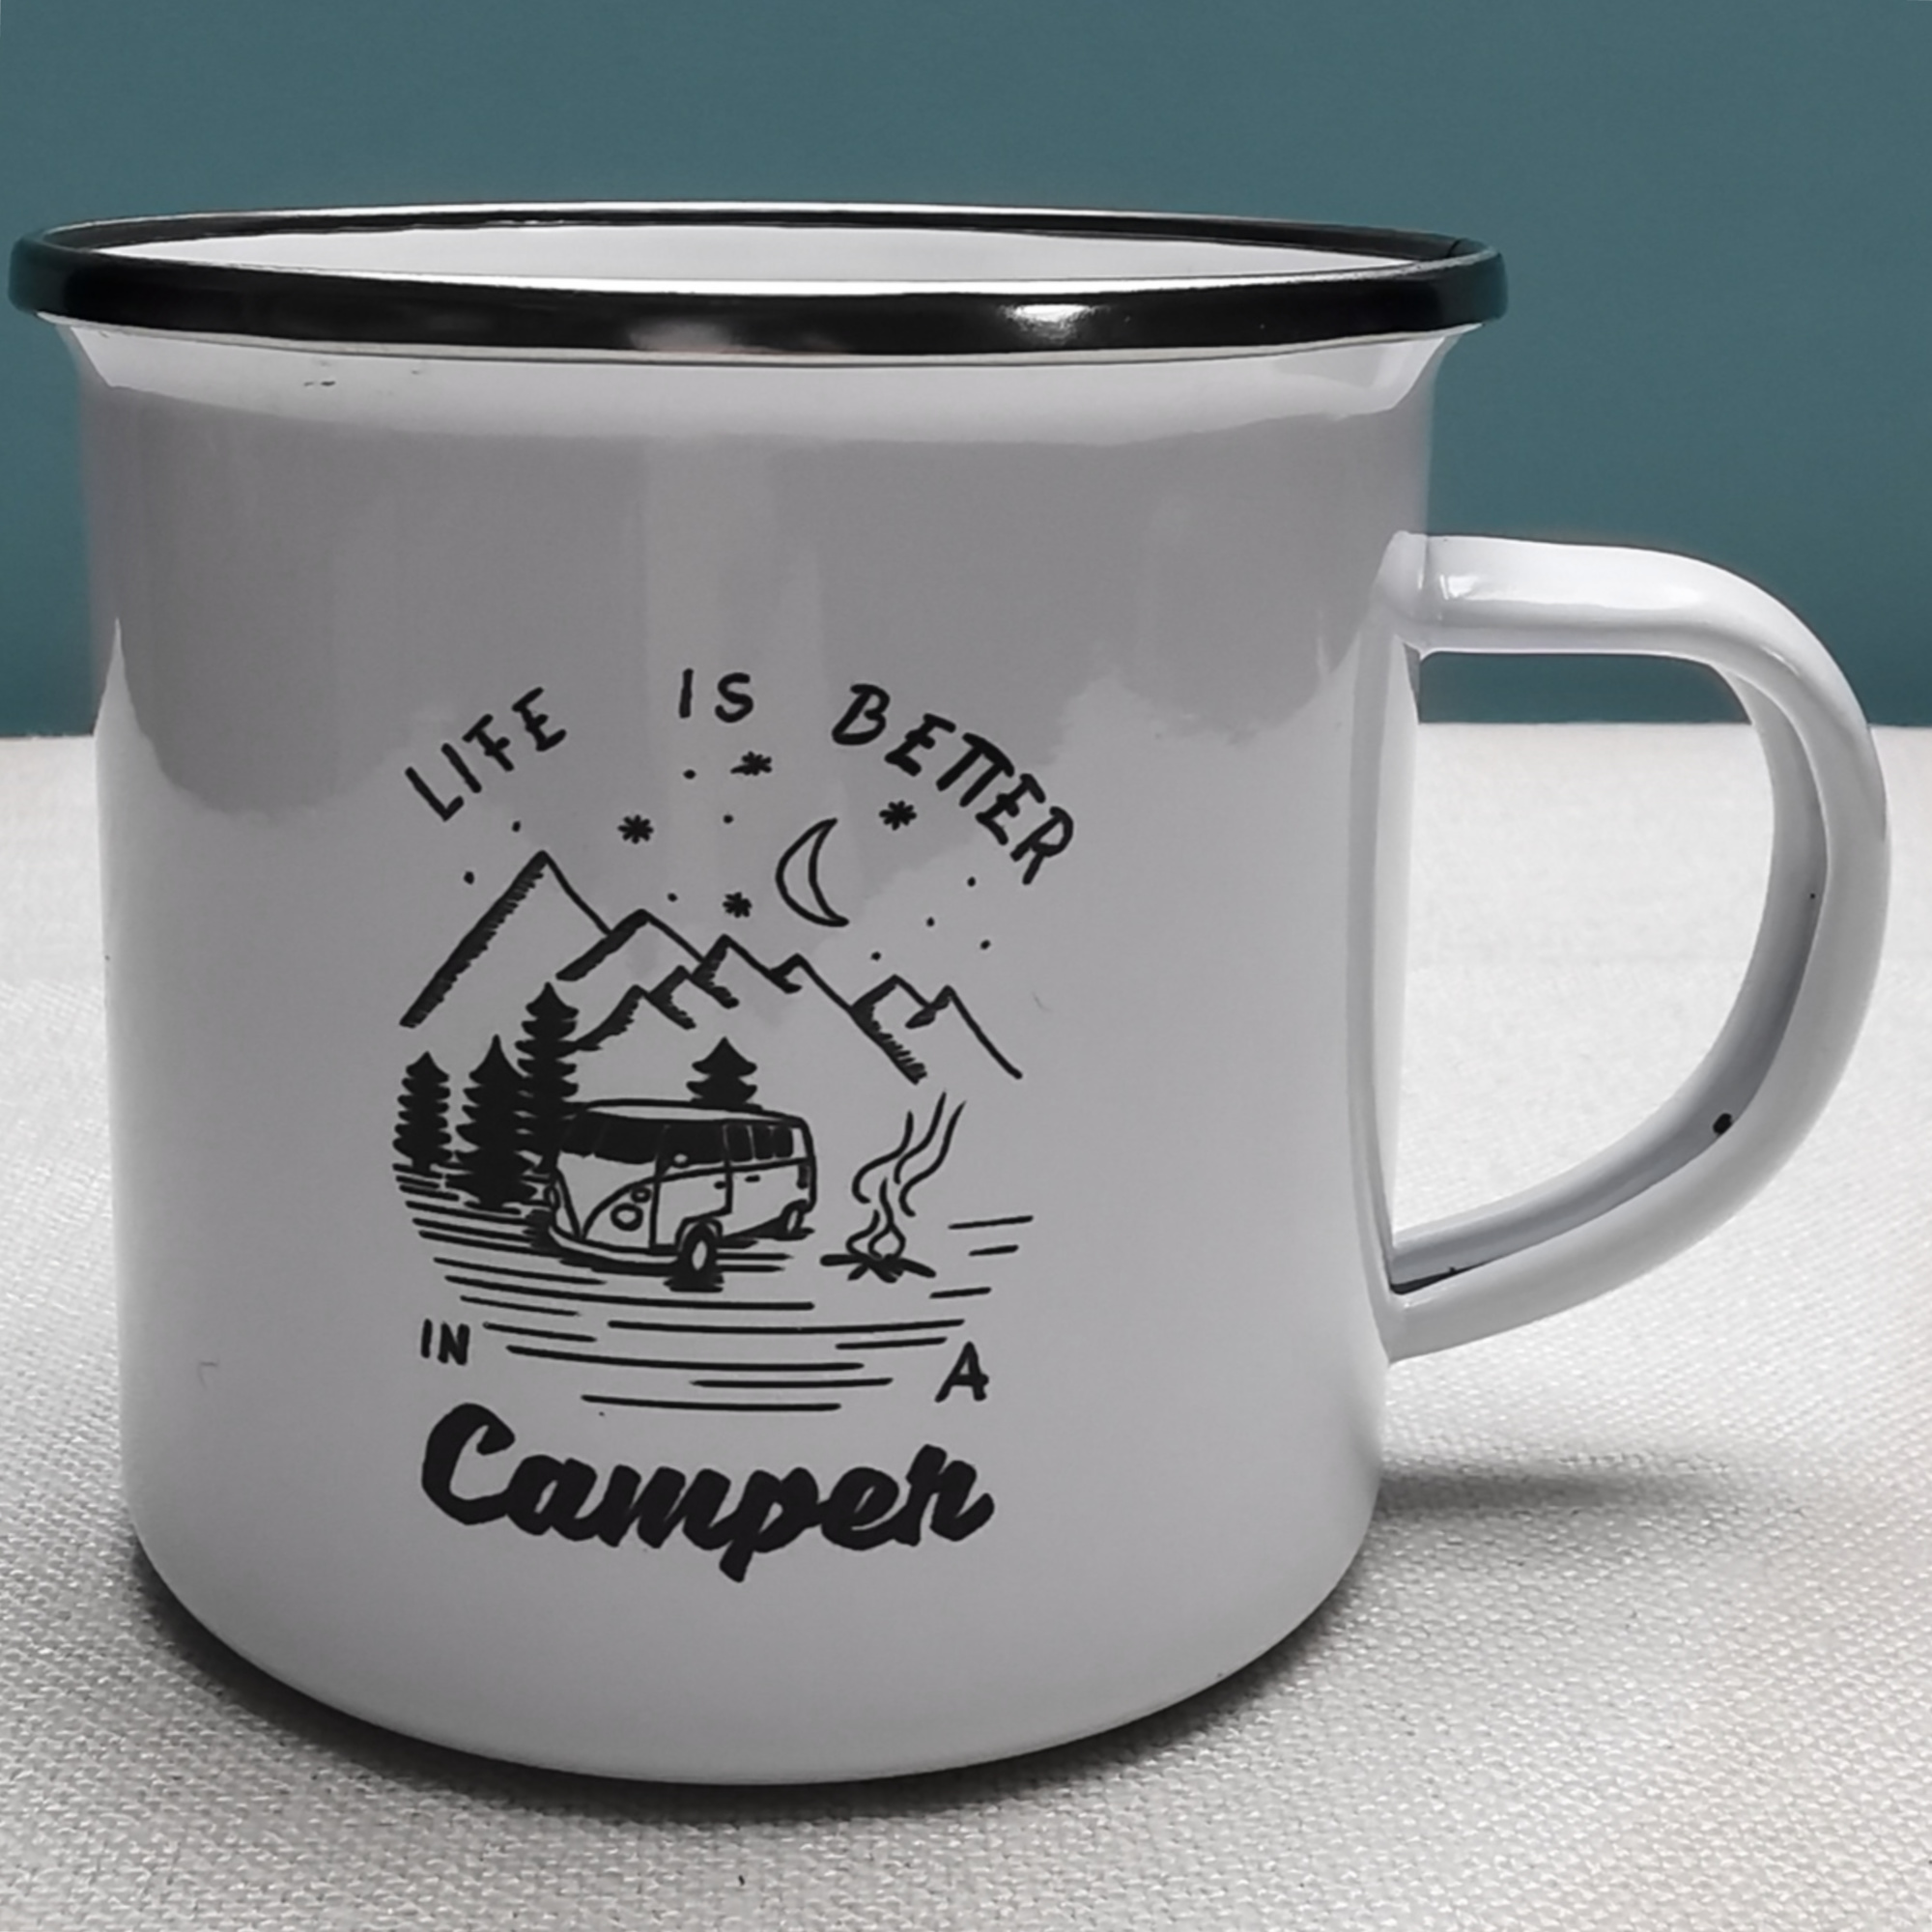 Camper Enamel Mug